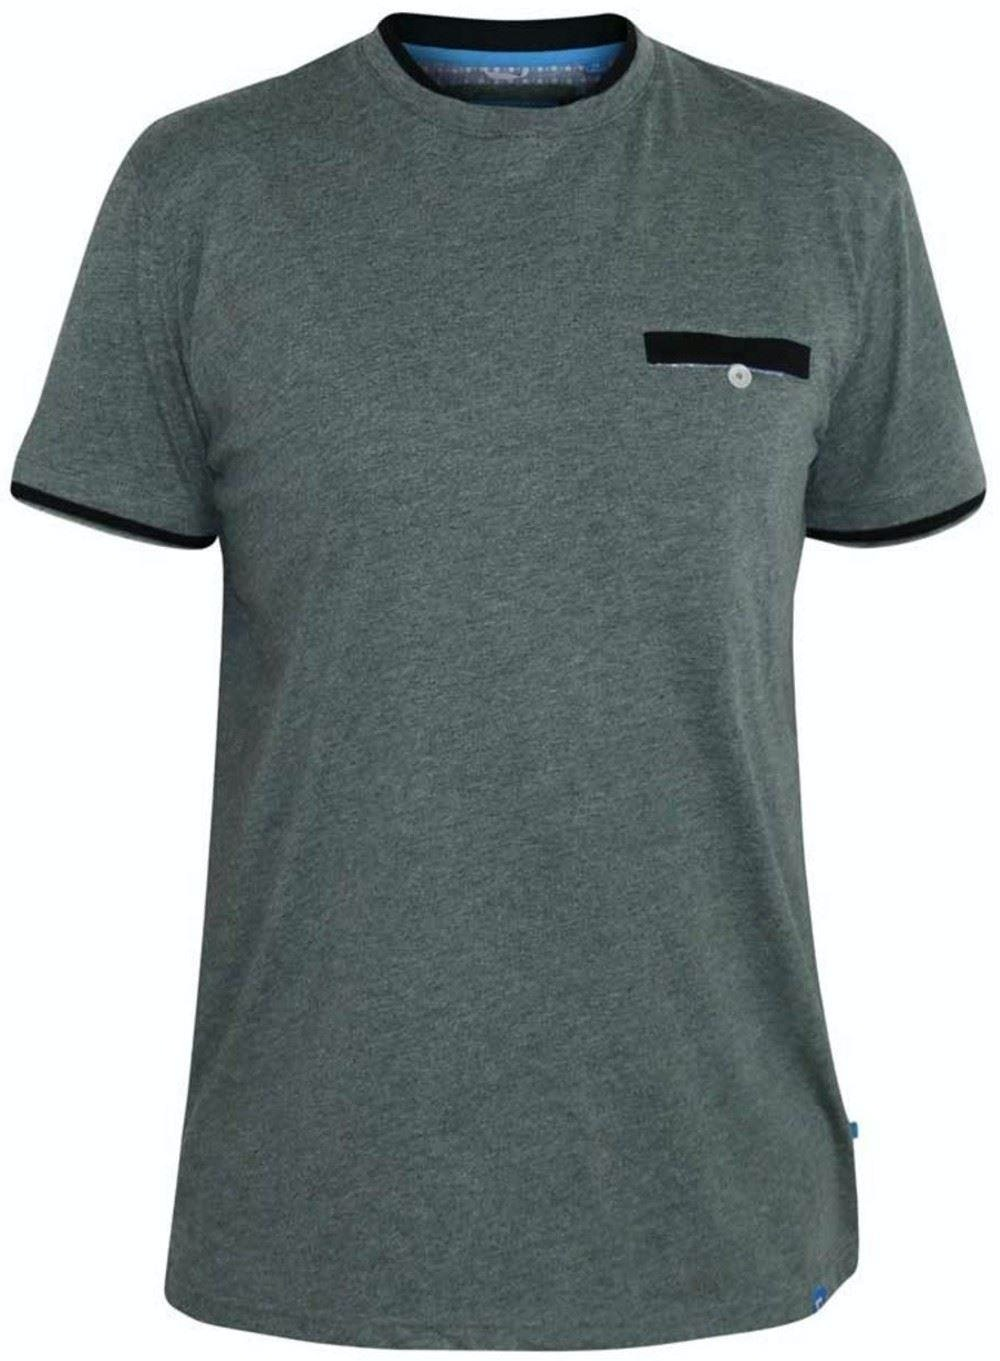 D555 Nelly Double Layer Neck & Pocket T-Shirt Khaki